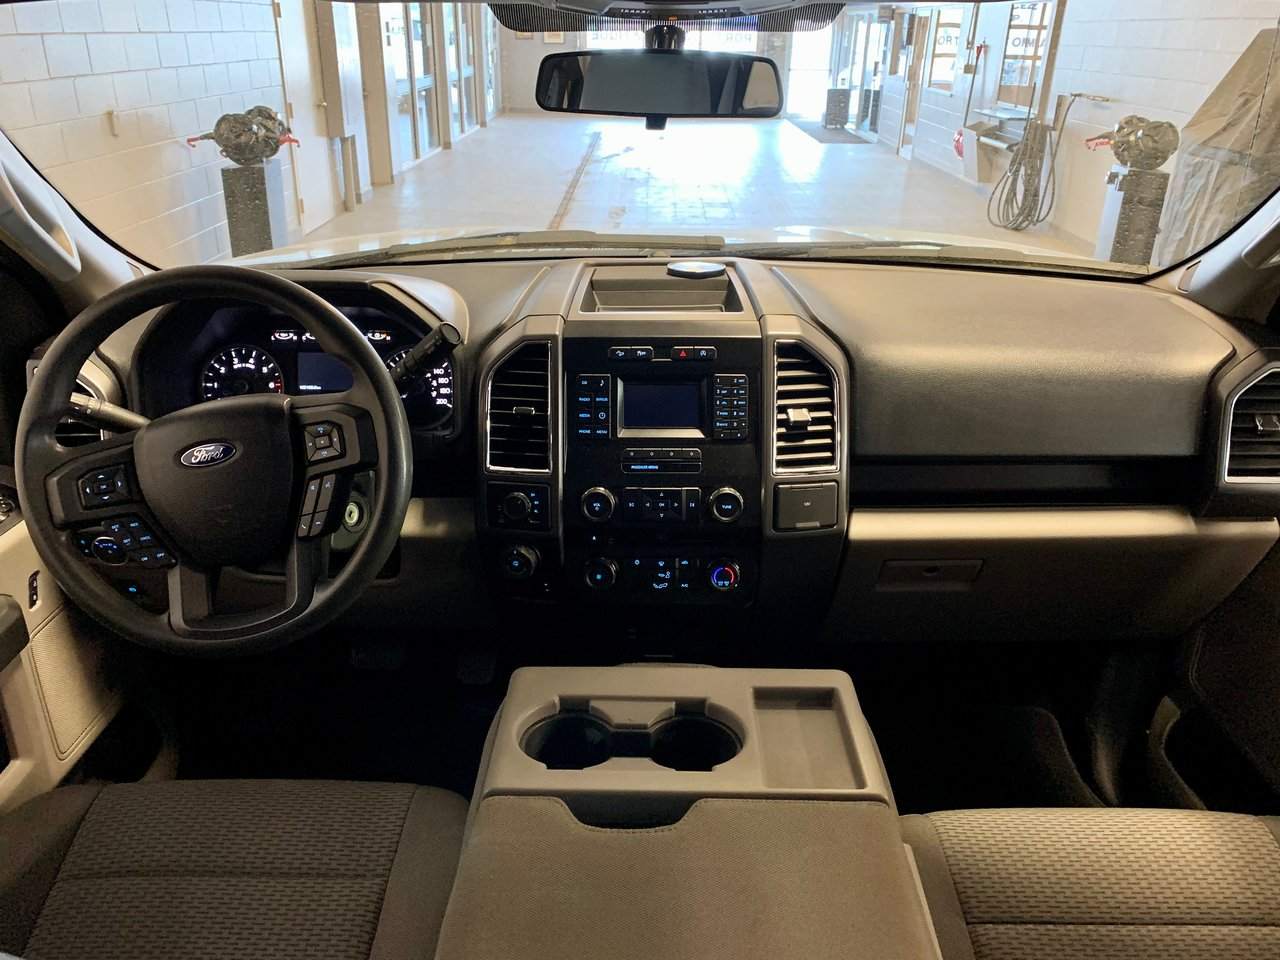 2016 Ford F-150 XLT 300A JAMAIS ACCID / 2.7L + 3.55 DIFF + 5.5 BOX